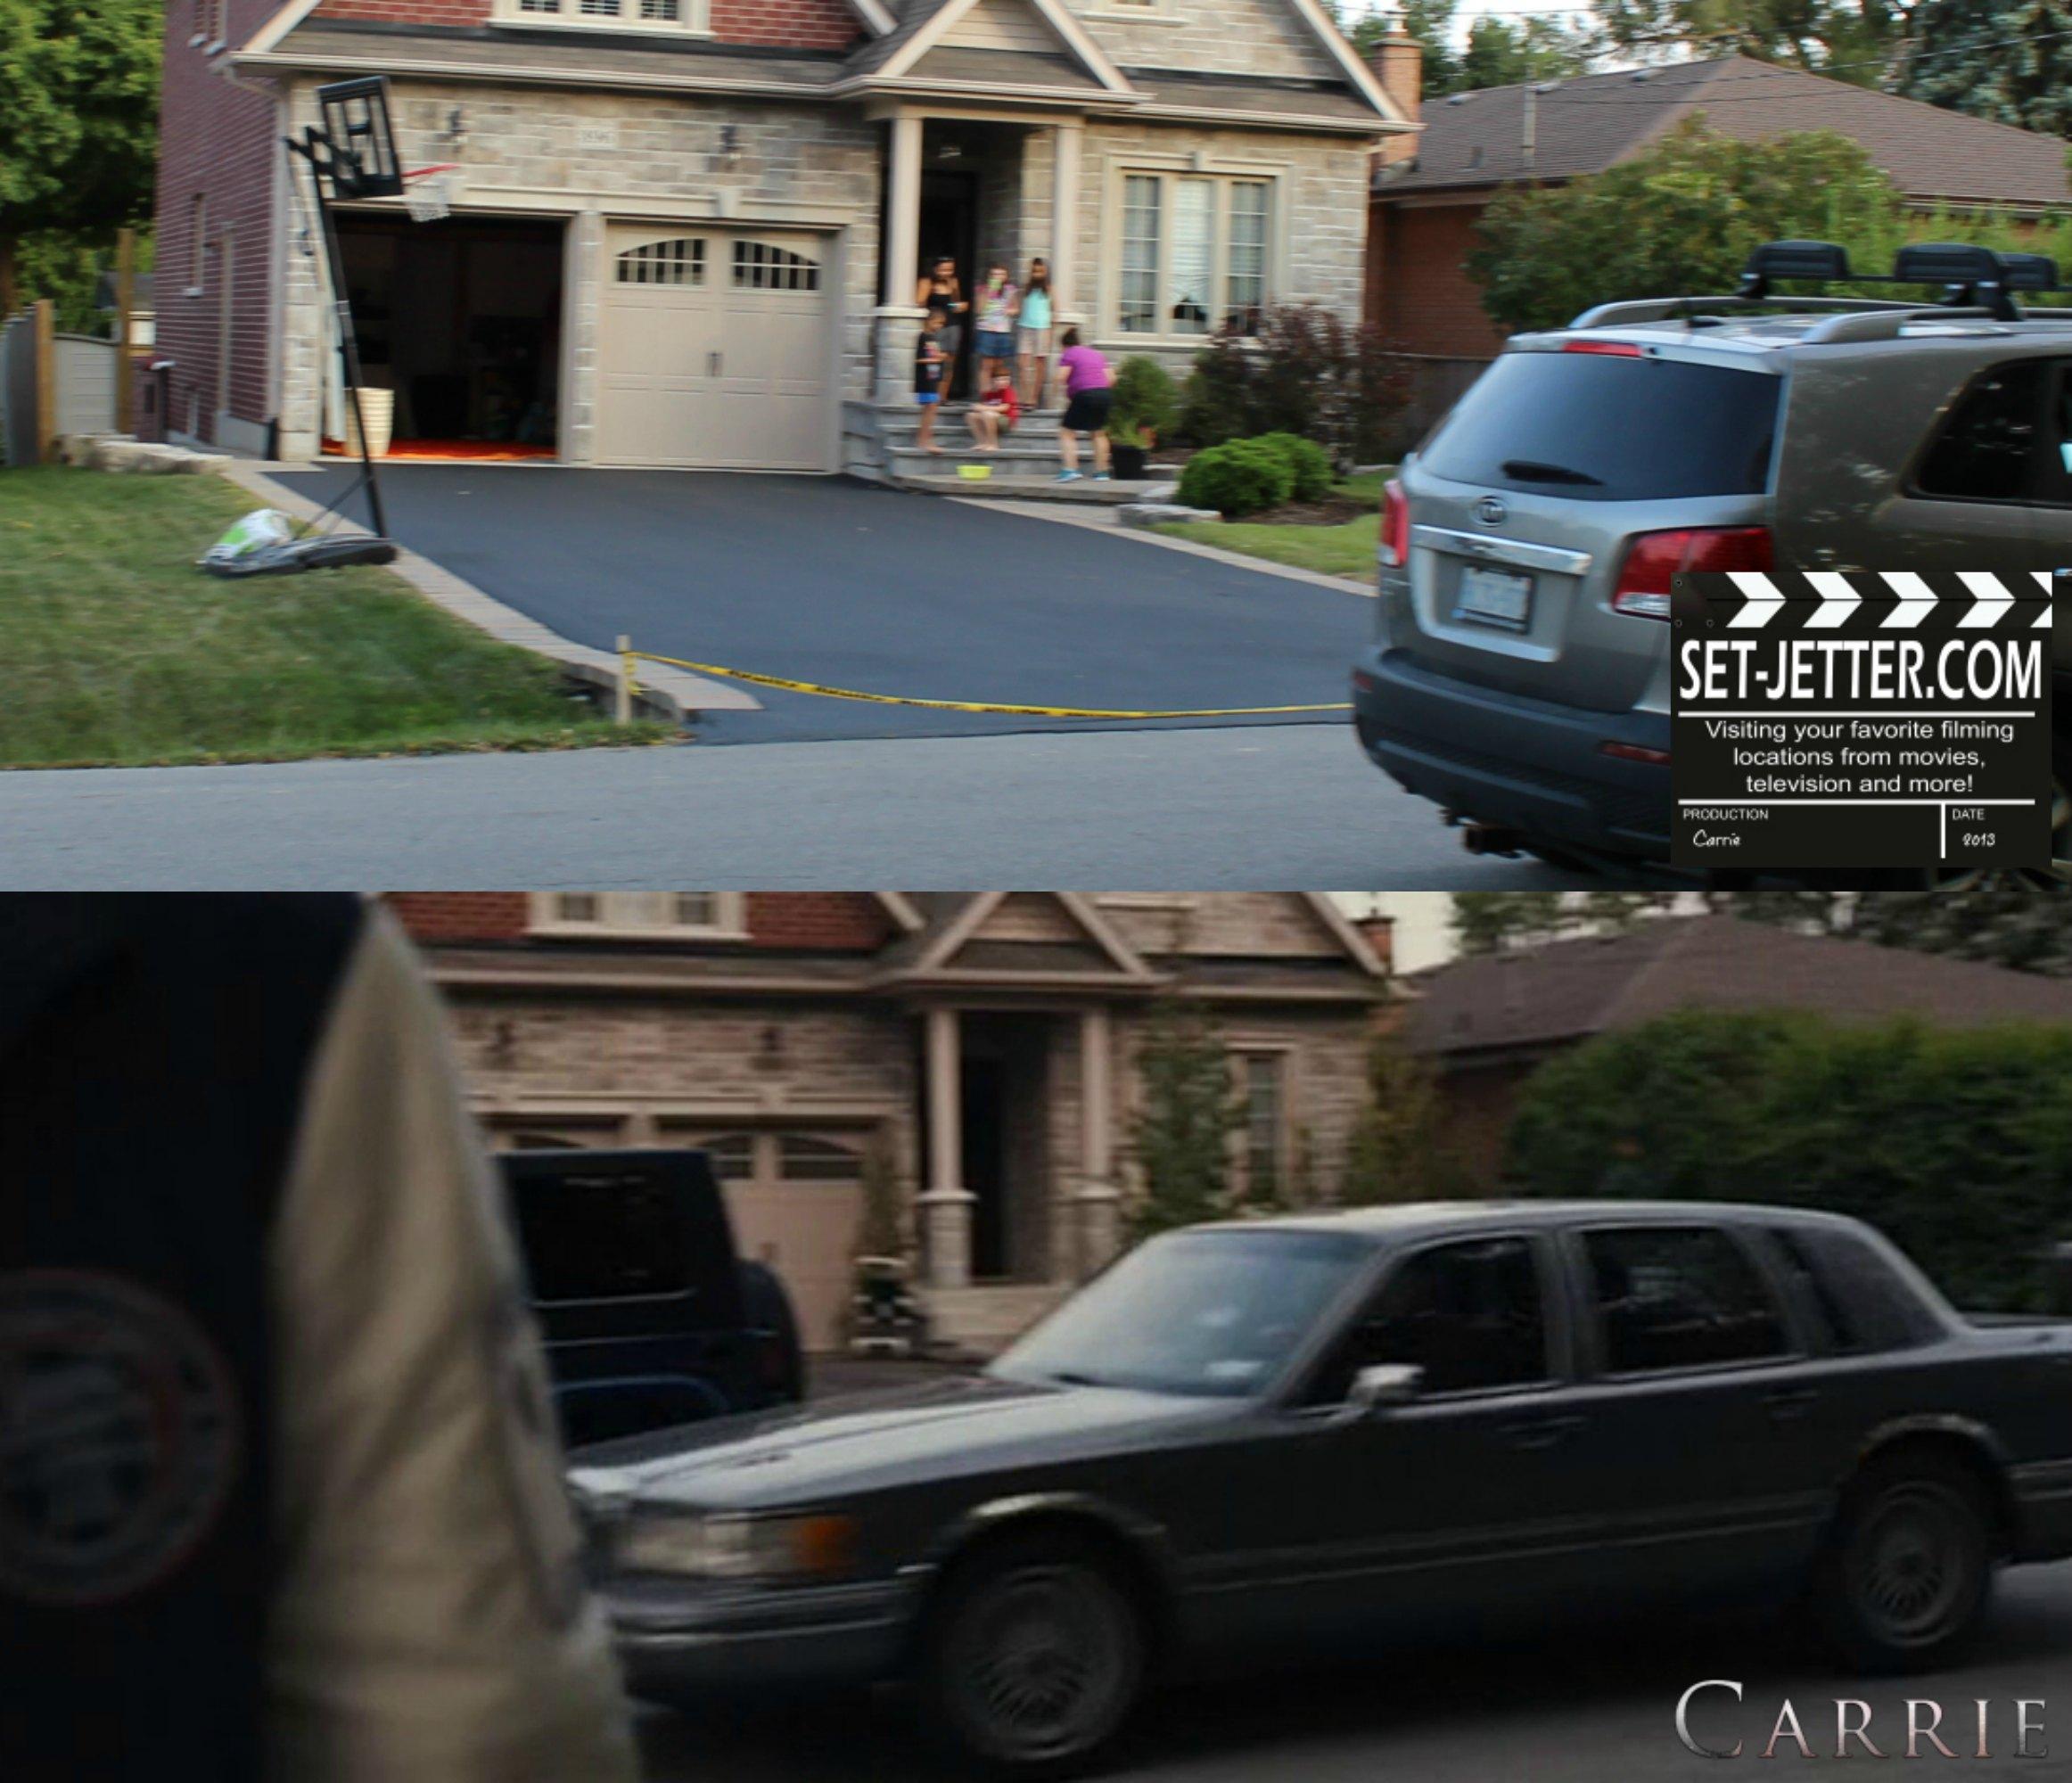 Carrie 2013 comparison 28.jpg